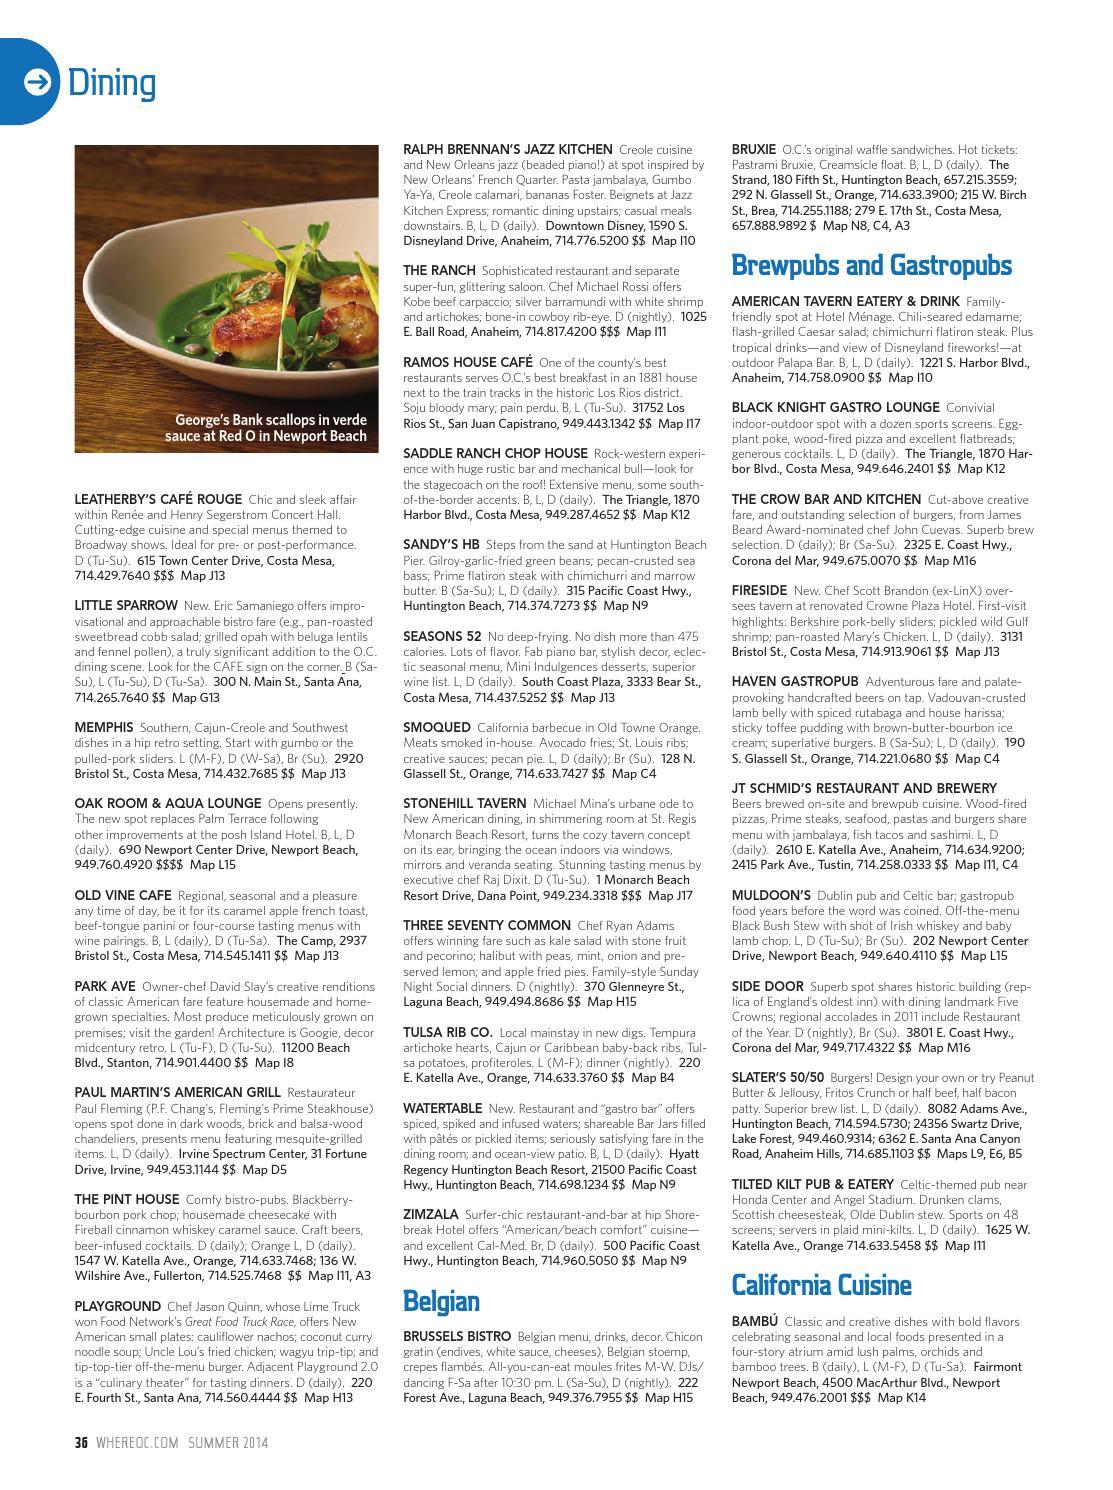 WHERE Orange County Magazine Summer 2014 by SoCalMedia - issuu